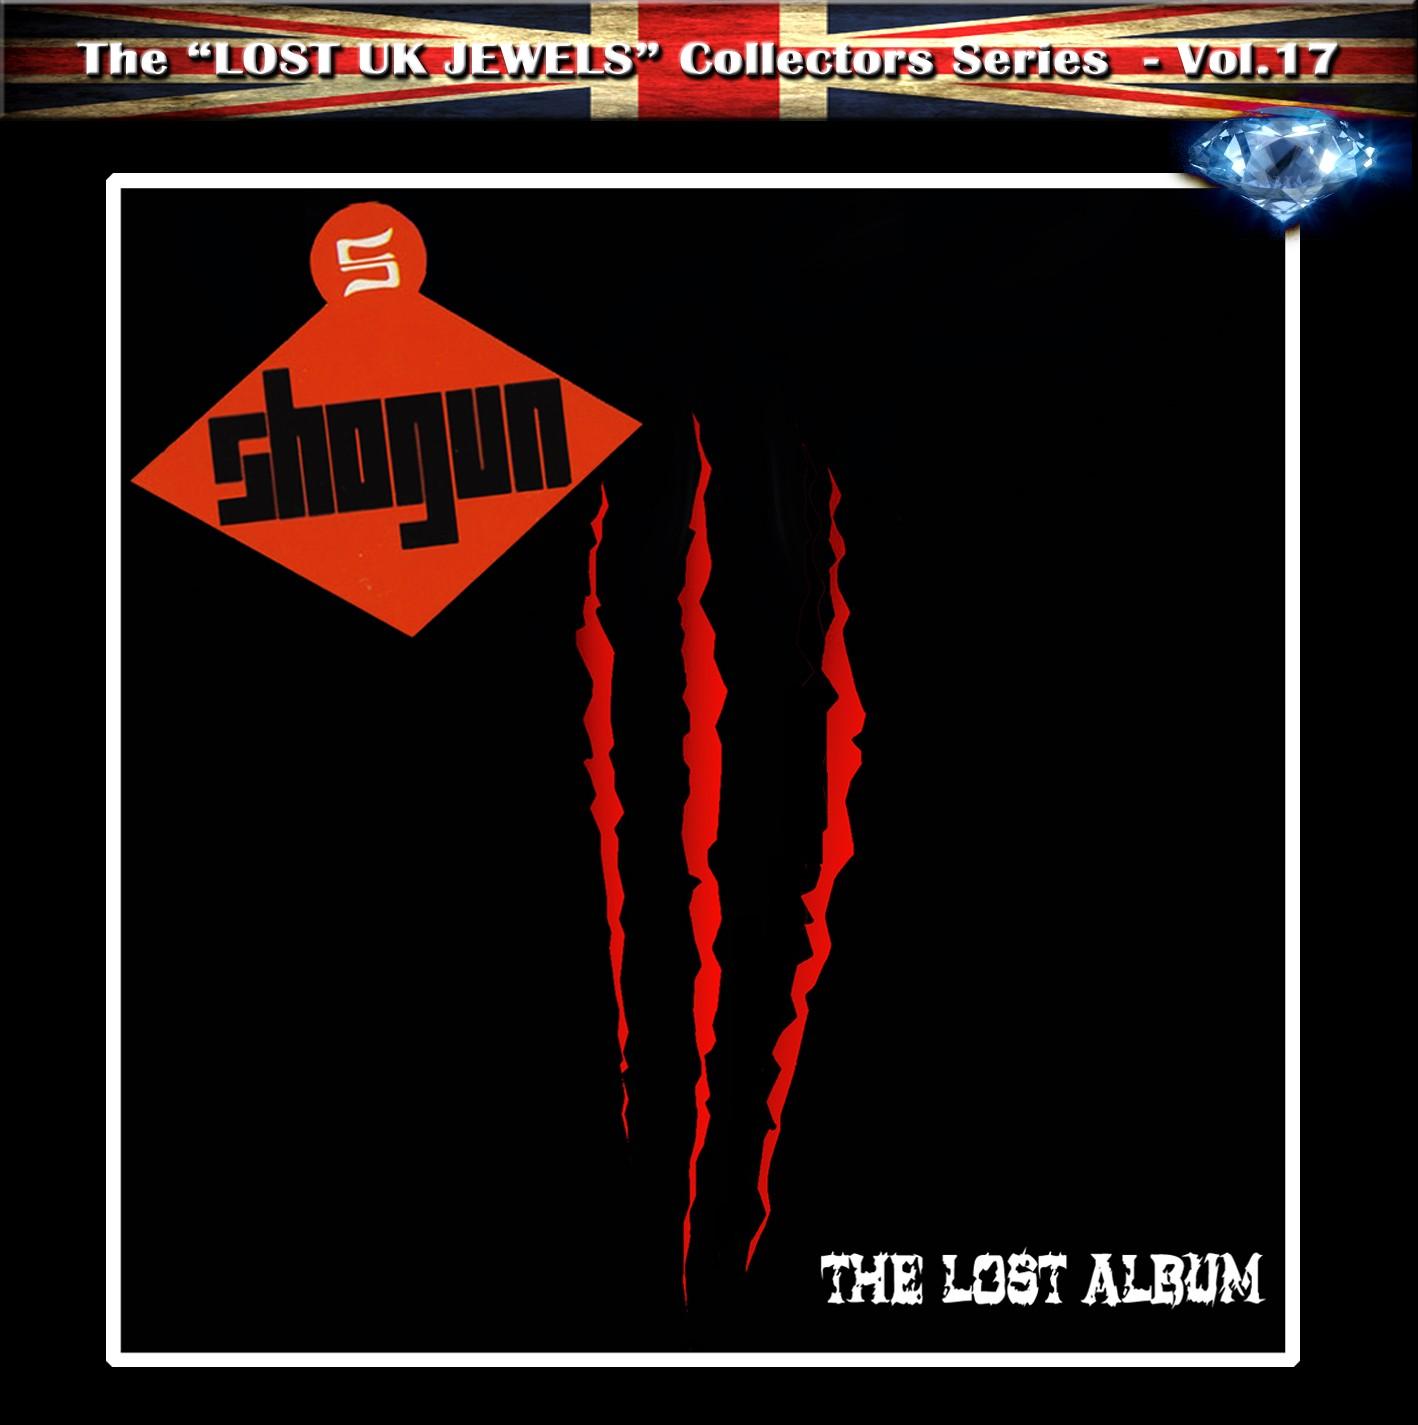 SHOGUN - The Lost Album (digitally remastered)